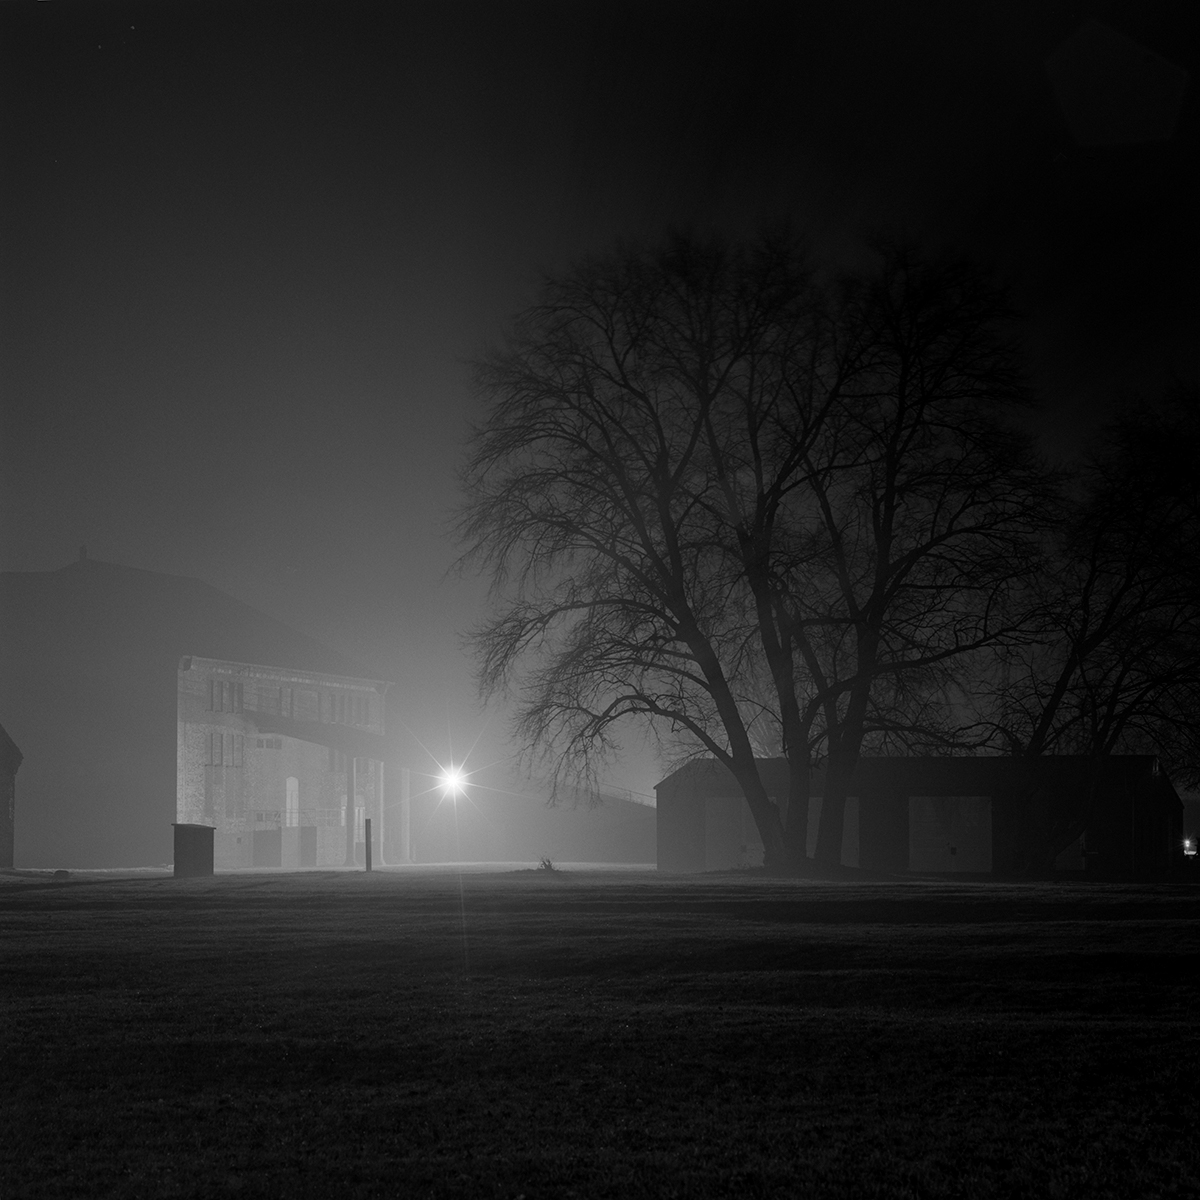 Gedenkstätte Konzentrationslager Neuengamme